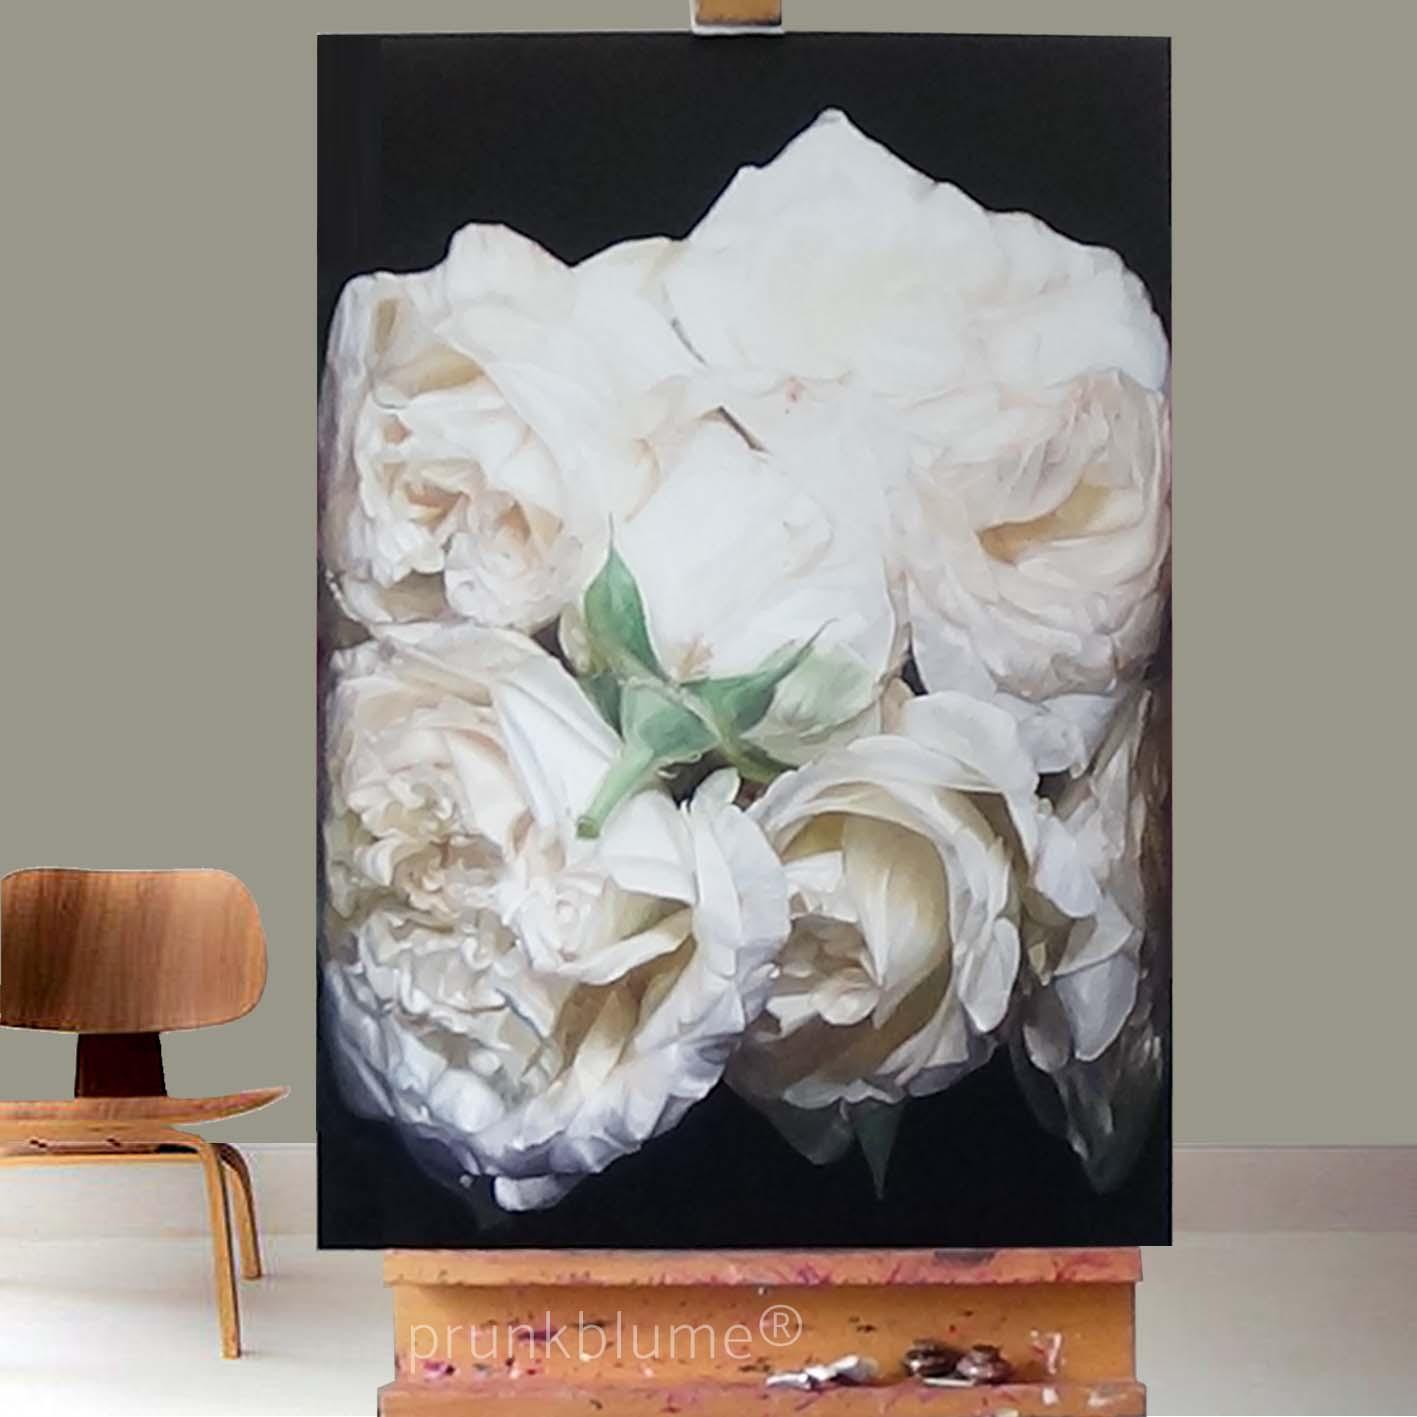 Rosenbilder in Öl, prunkblume- die Sprache der Rosen